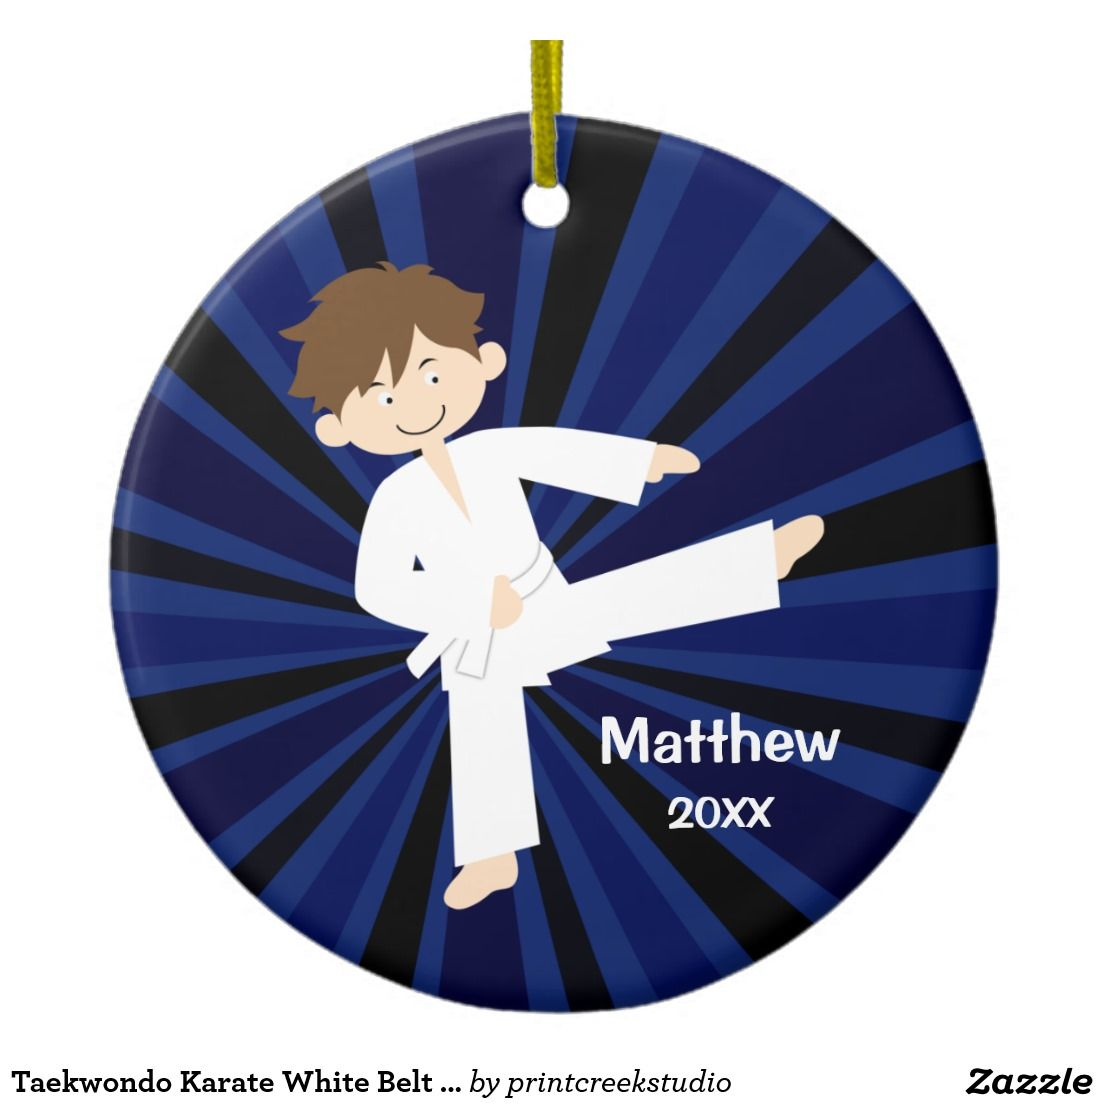 Karate christmas ornament - Taekwondo Karate White Belt Boy Personalized Ceramic Ornament